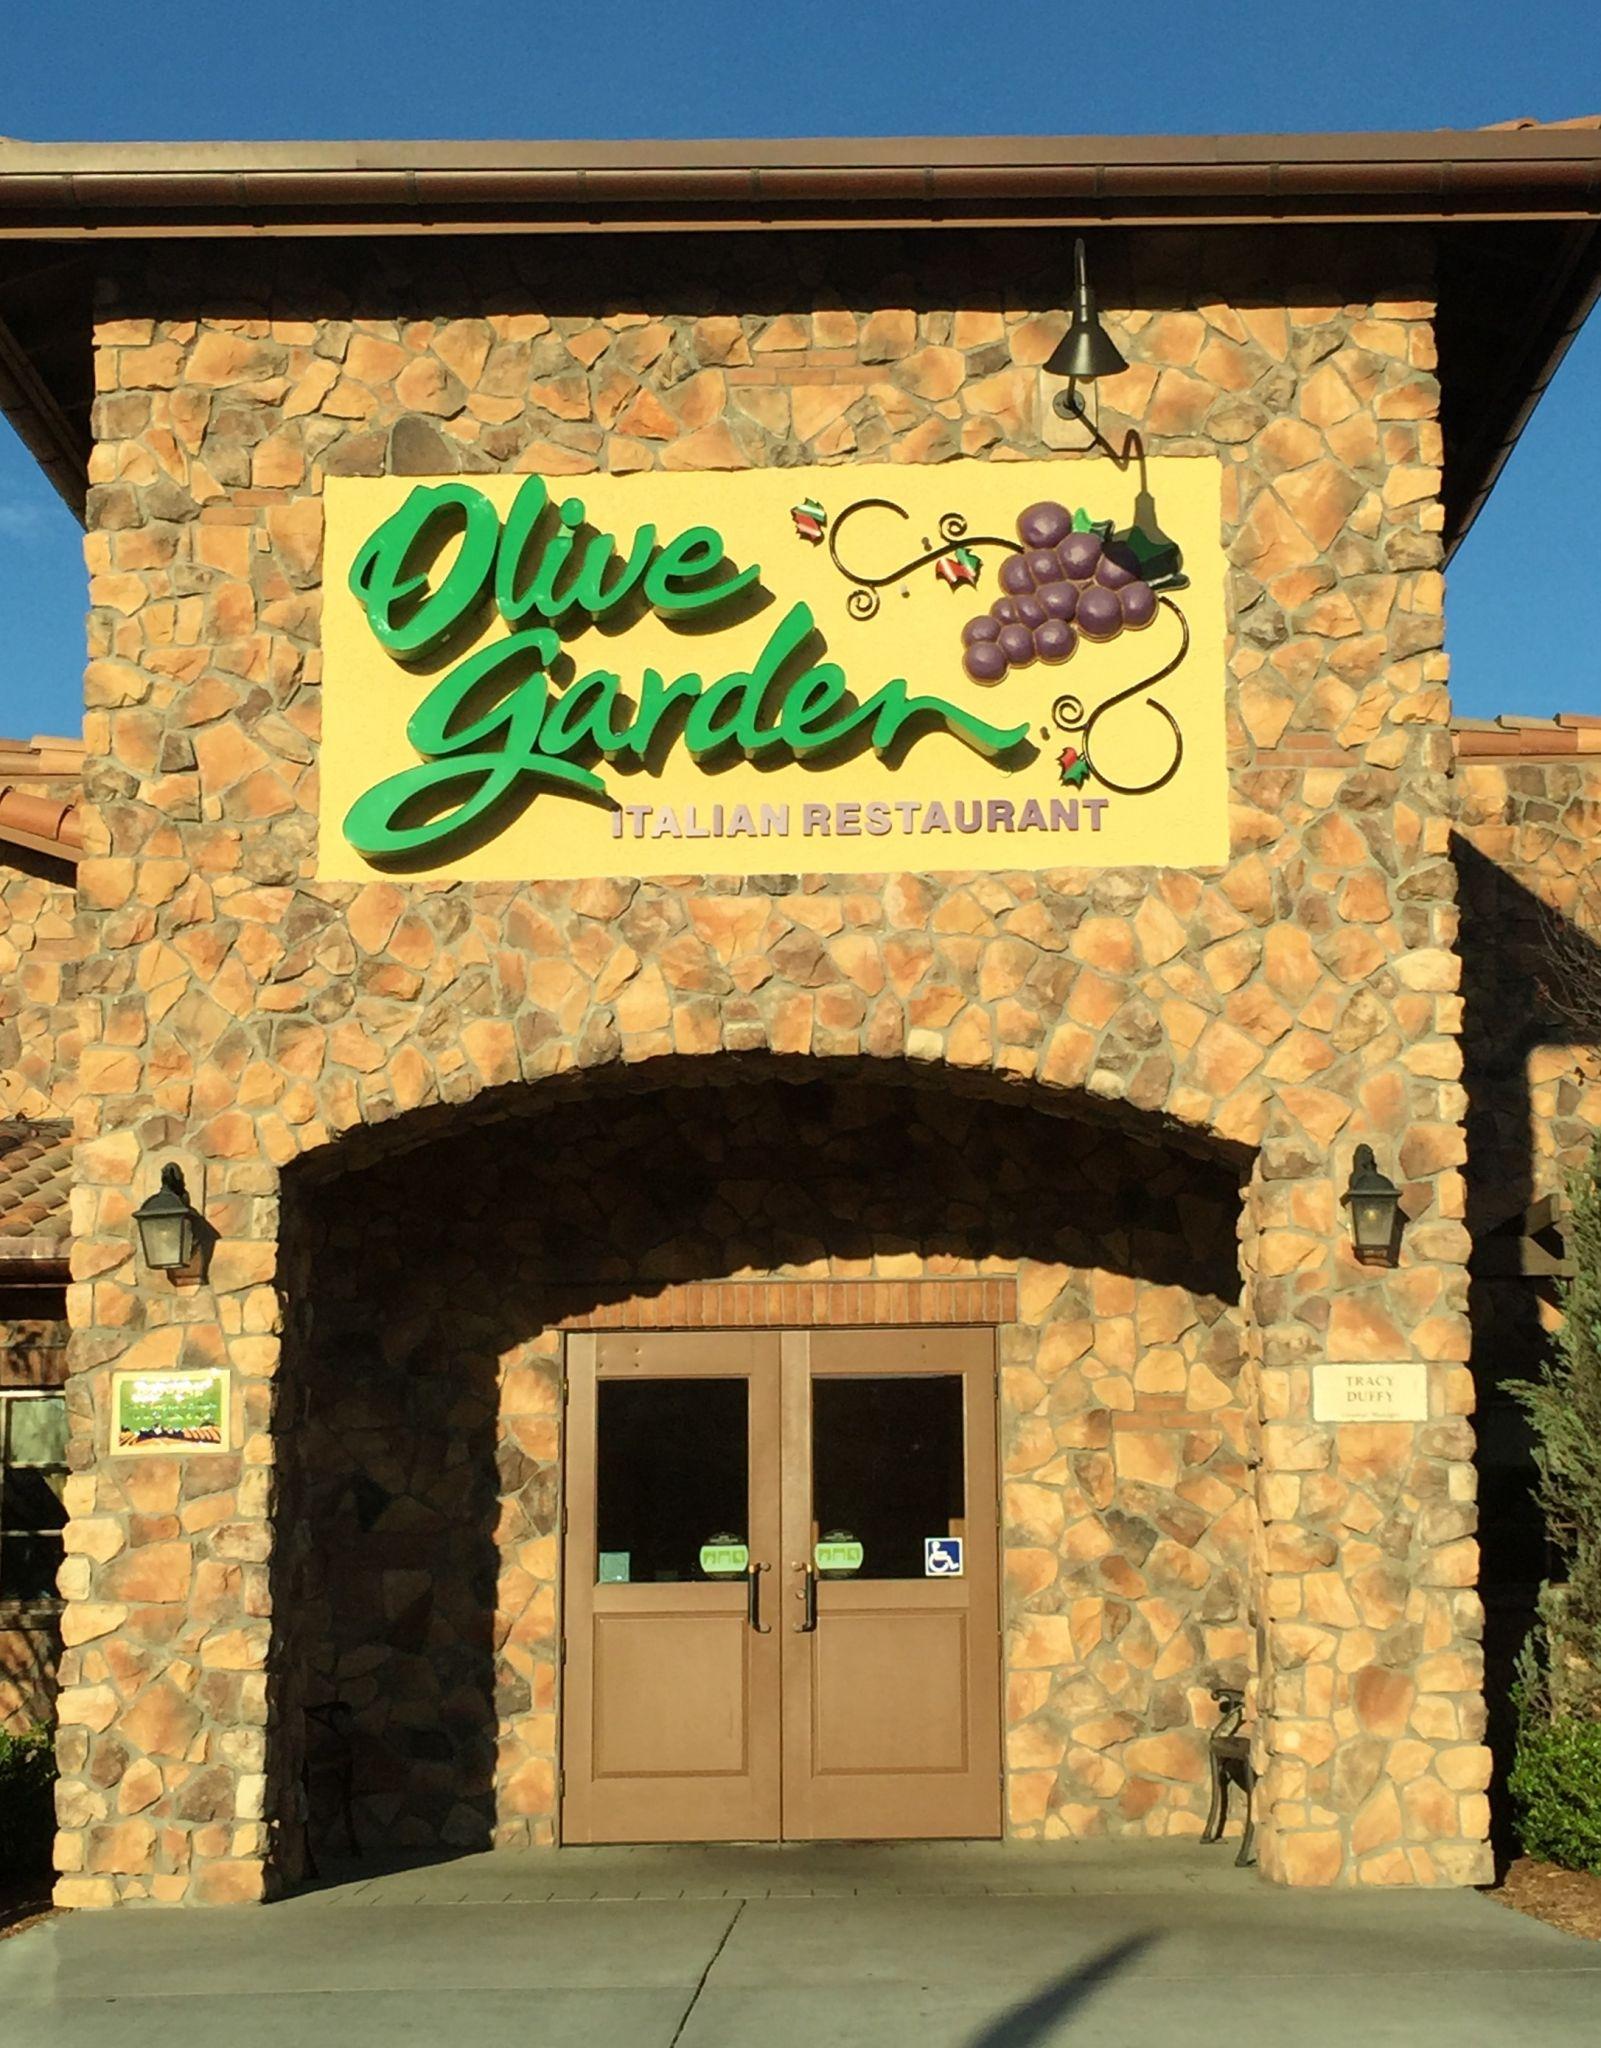 Olive Garden Longhorn Steakhouse To Offer Discounts On Veterans Day Beaumont Enterprise